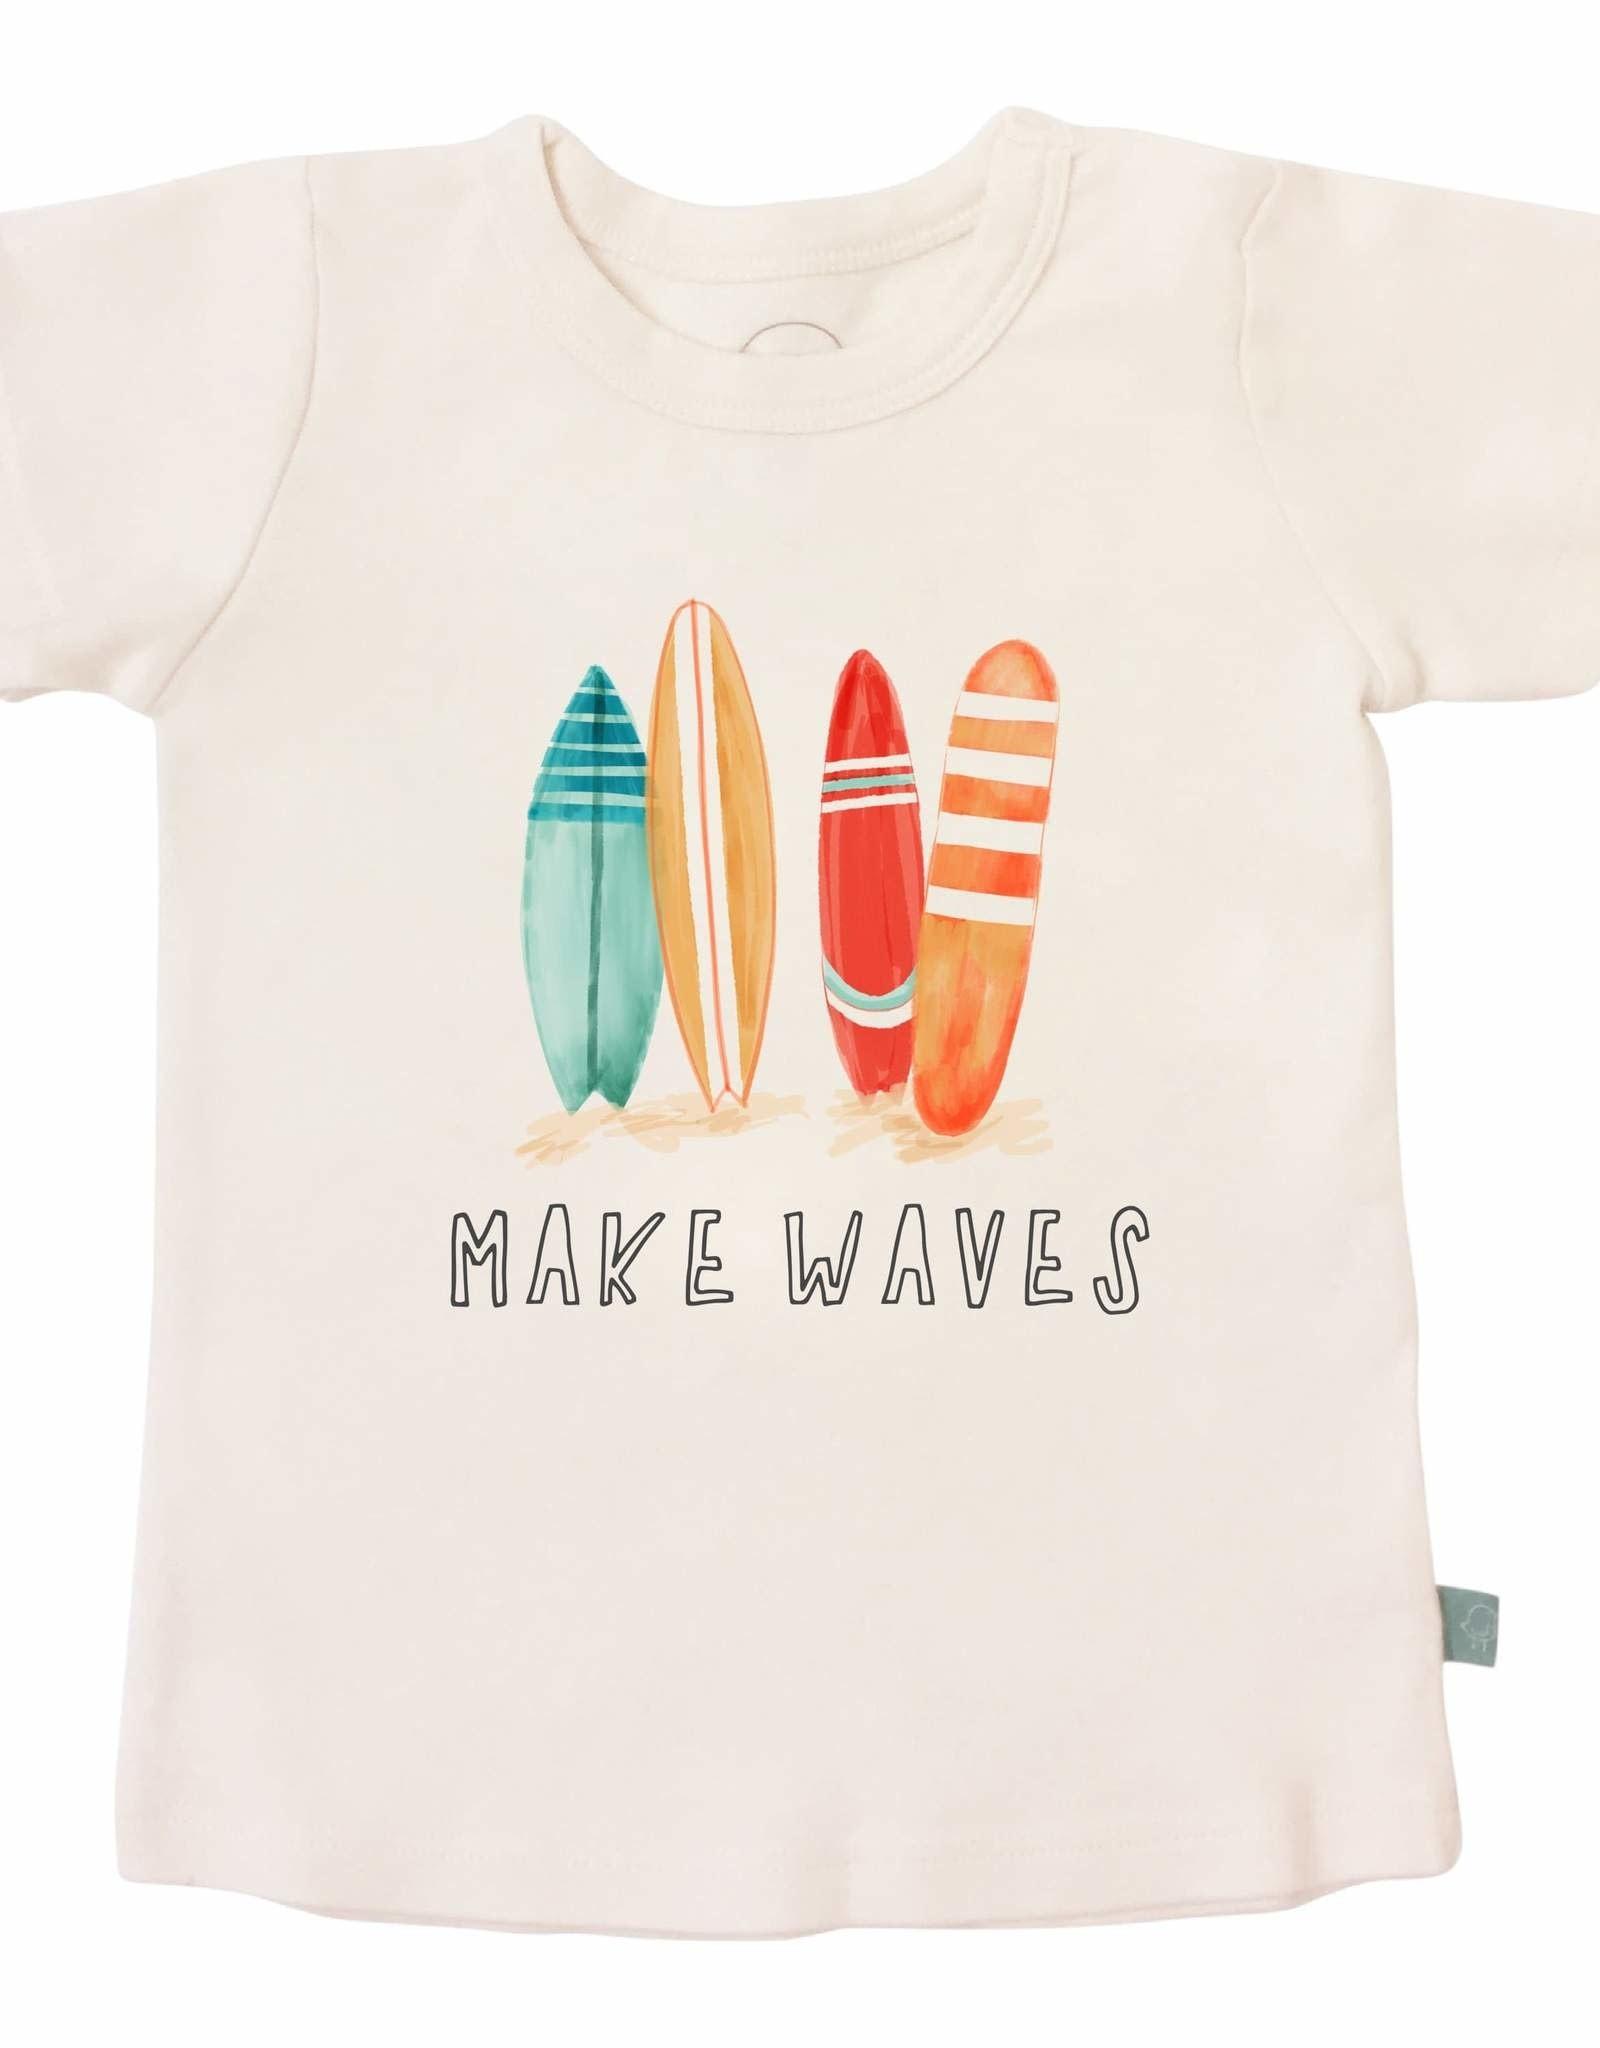 Finn & Emma Make Waves Tee